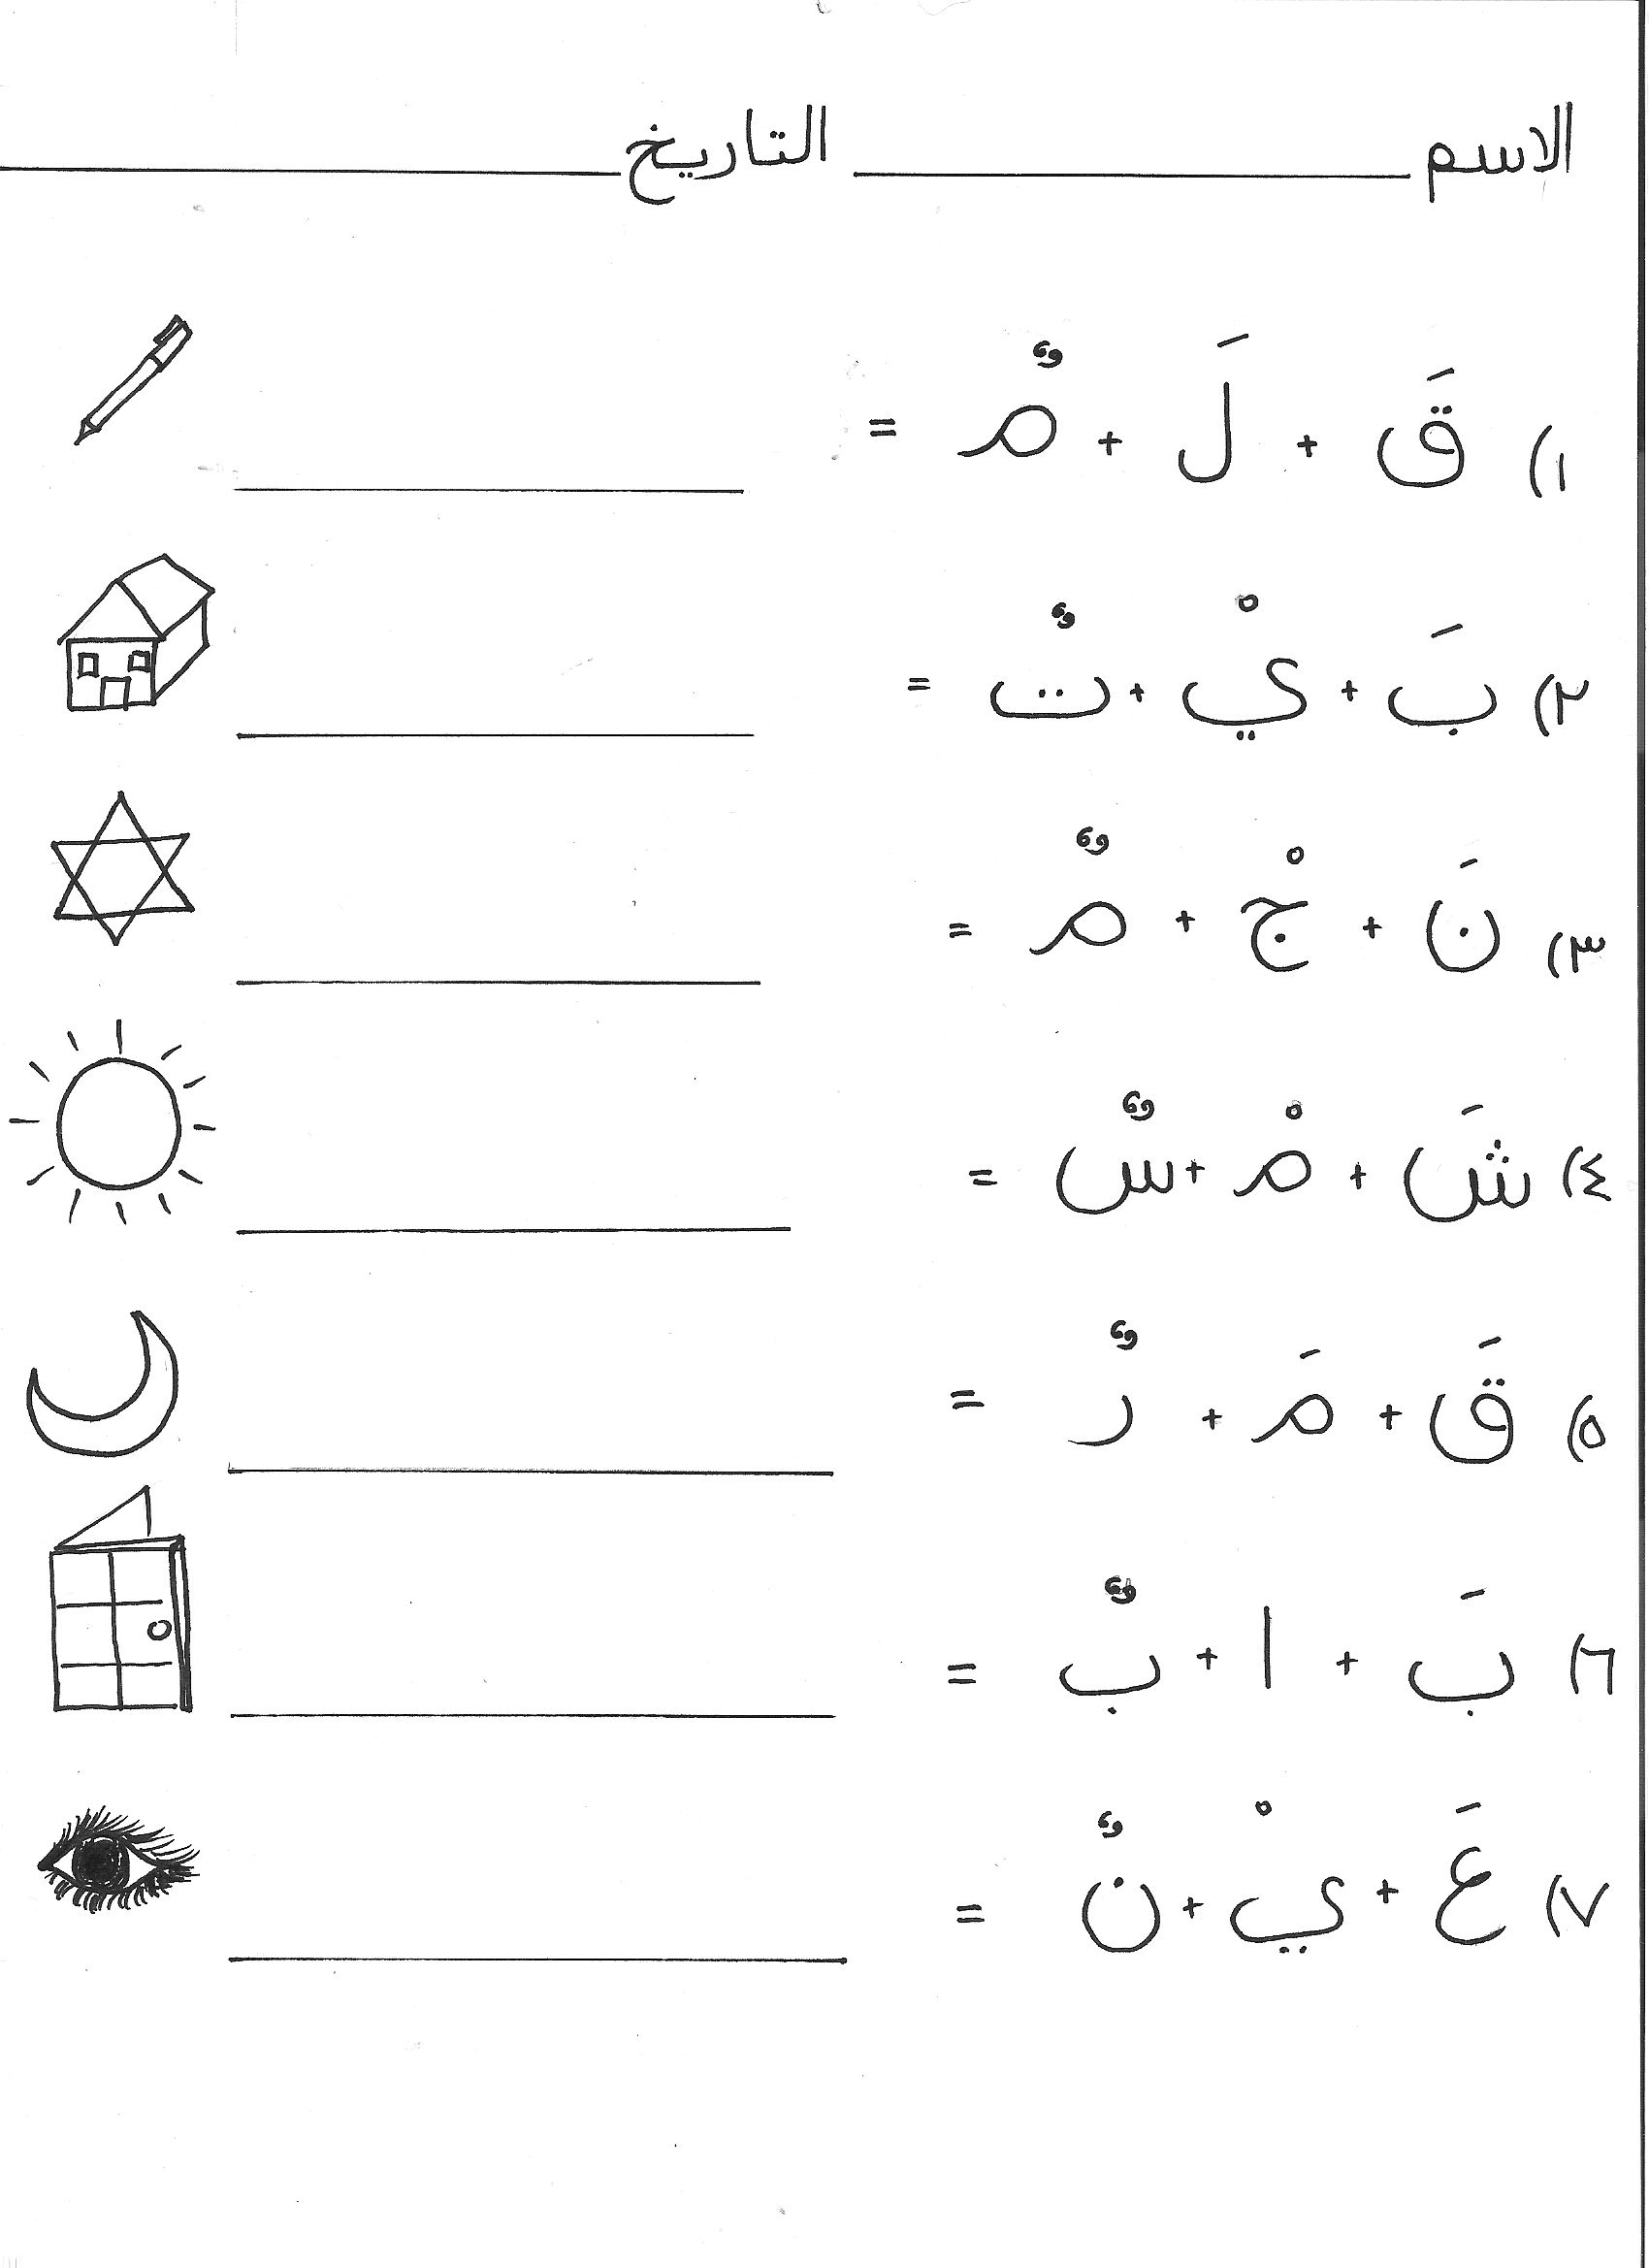 Joining Letters To Make Words - Funarabicworksheets | Arabic inside Arabic Alphabet Worksheets Grade 1 Pdf